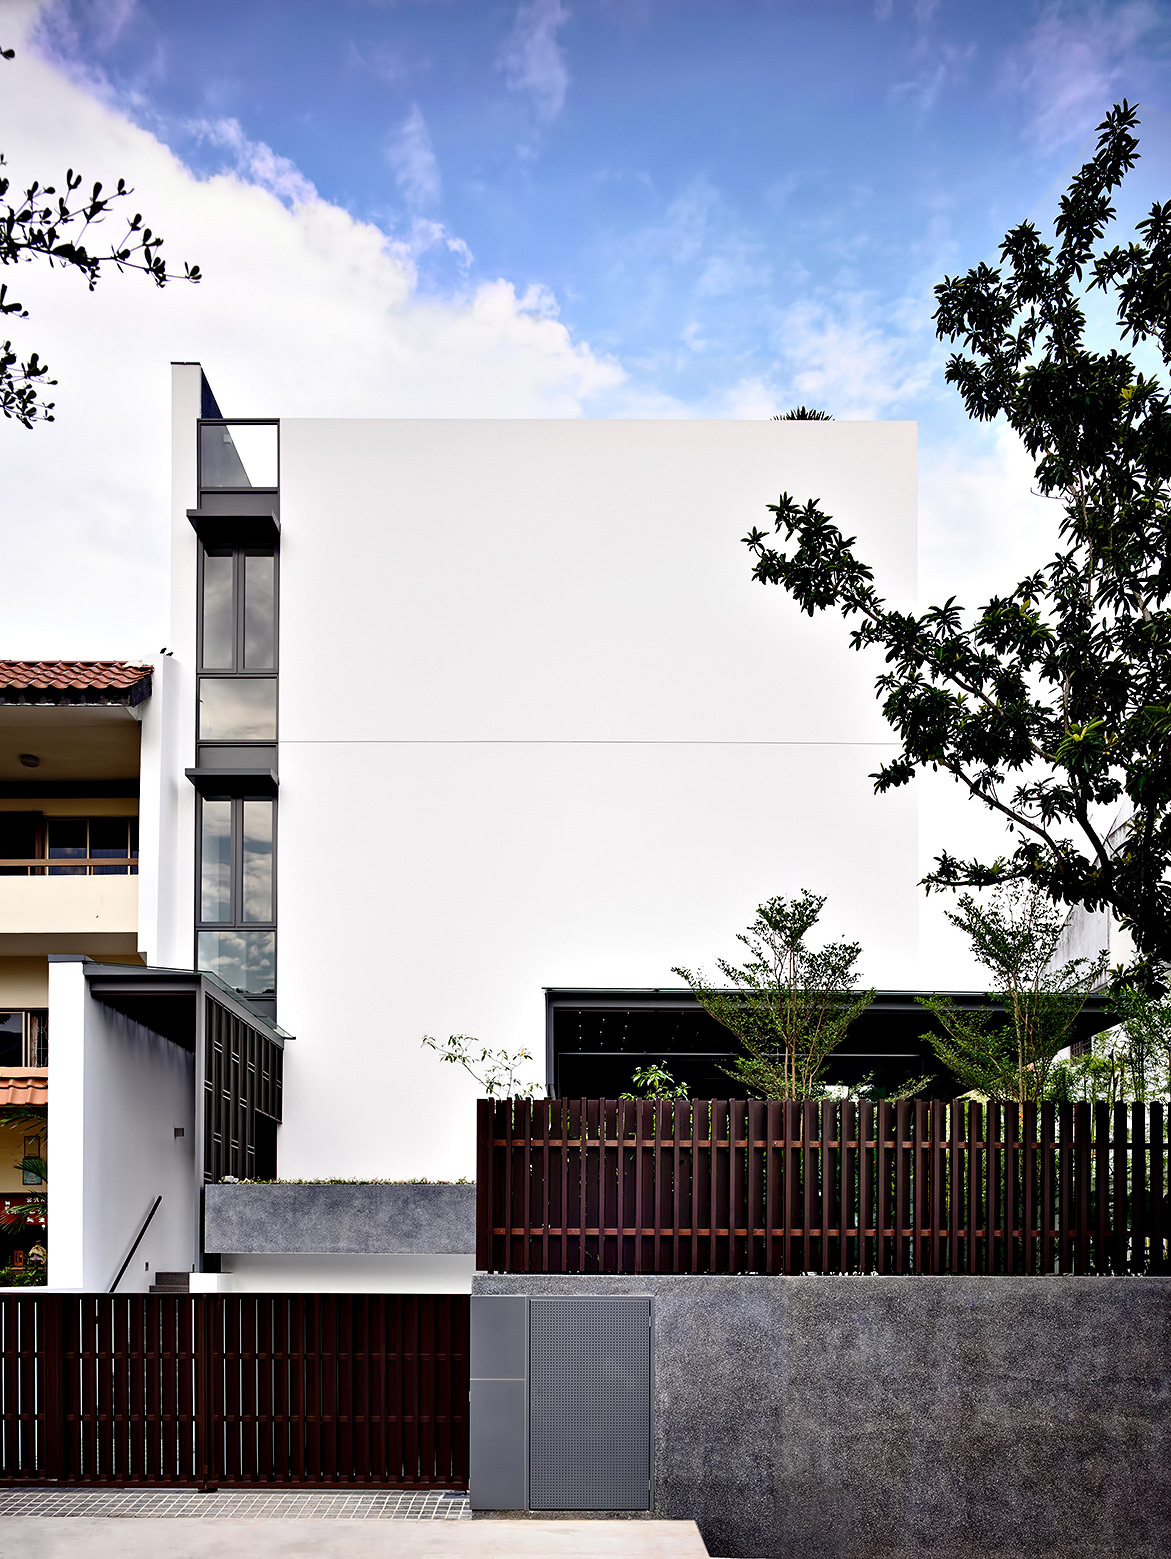 Vertical Court Luxury Residence - Greenbank Park, Singapore